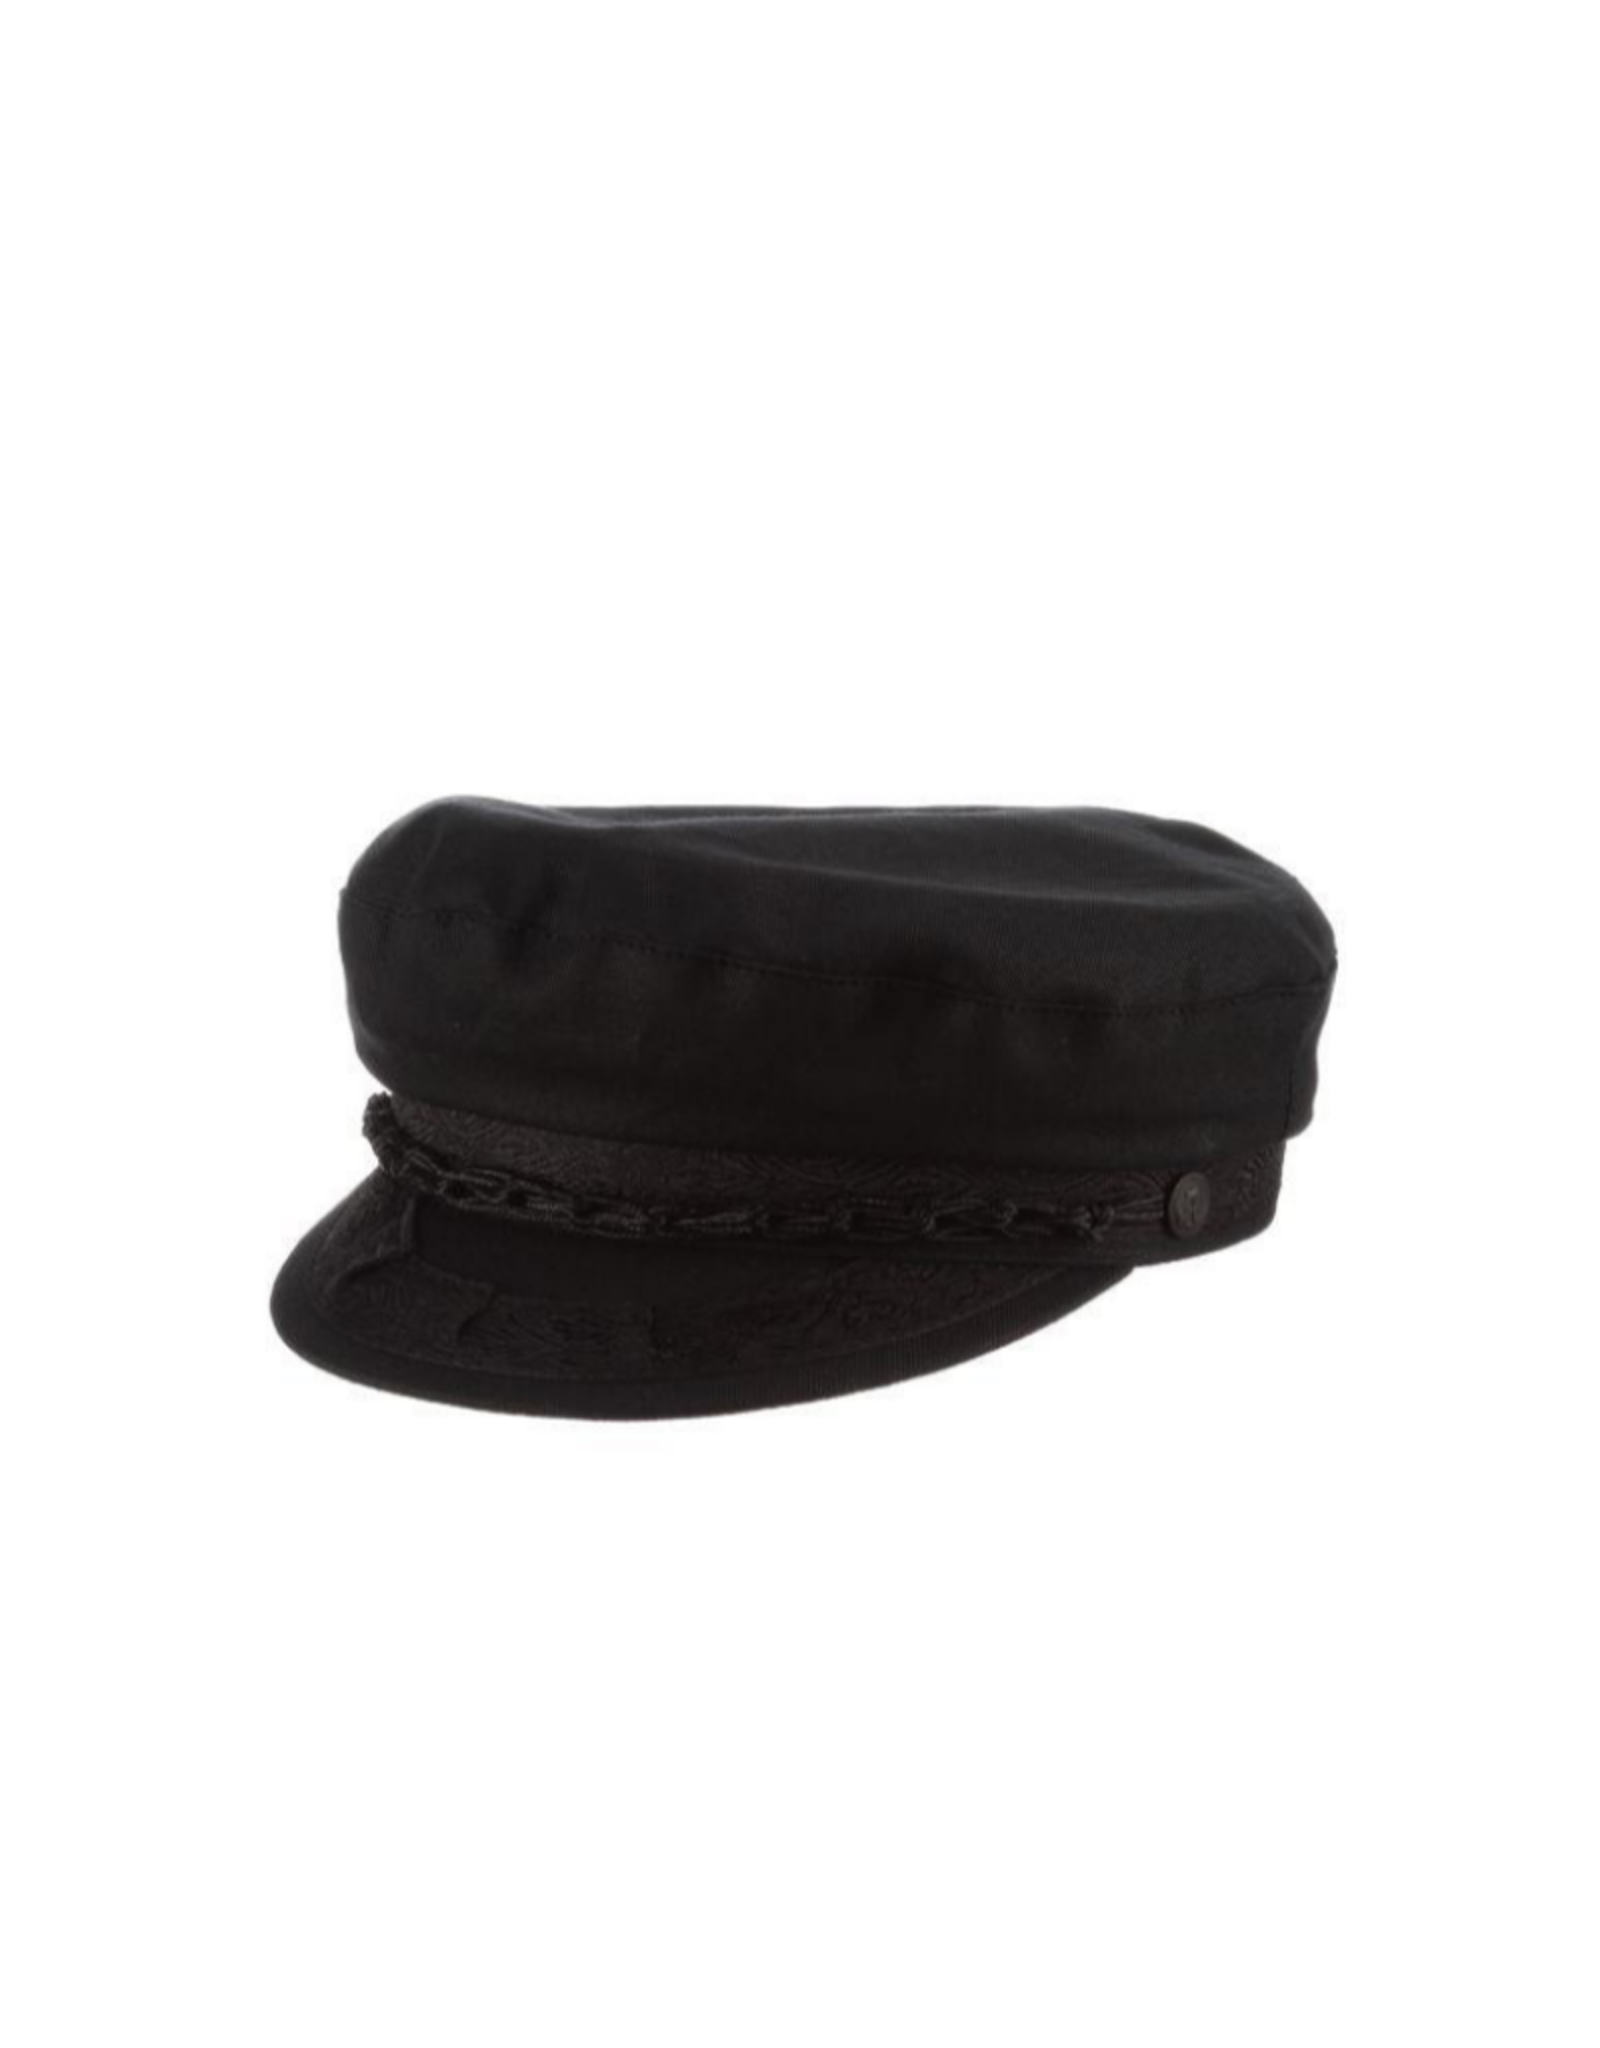 "HAT-FISHERMAN CAP ""ANAPOS"" COTTON"